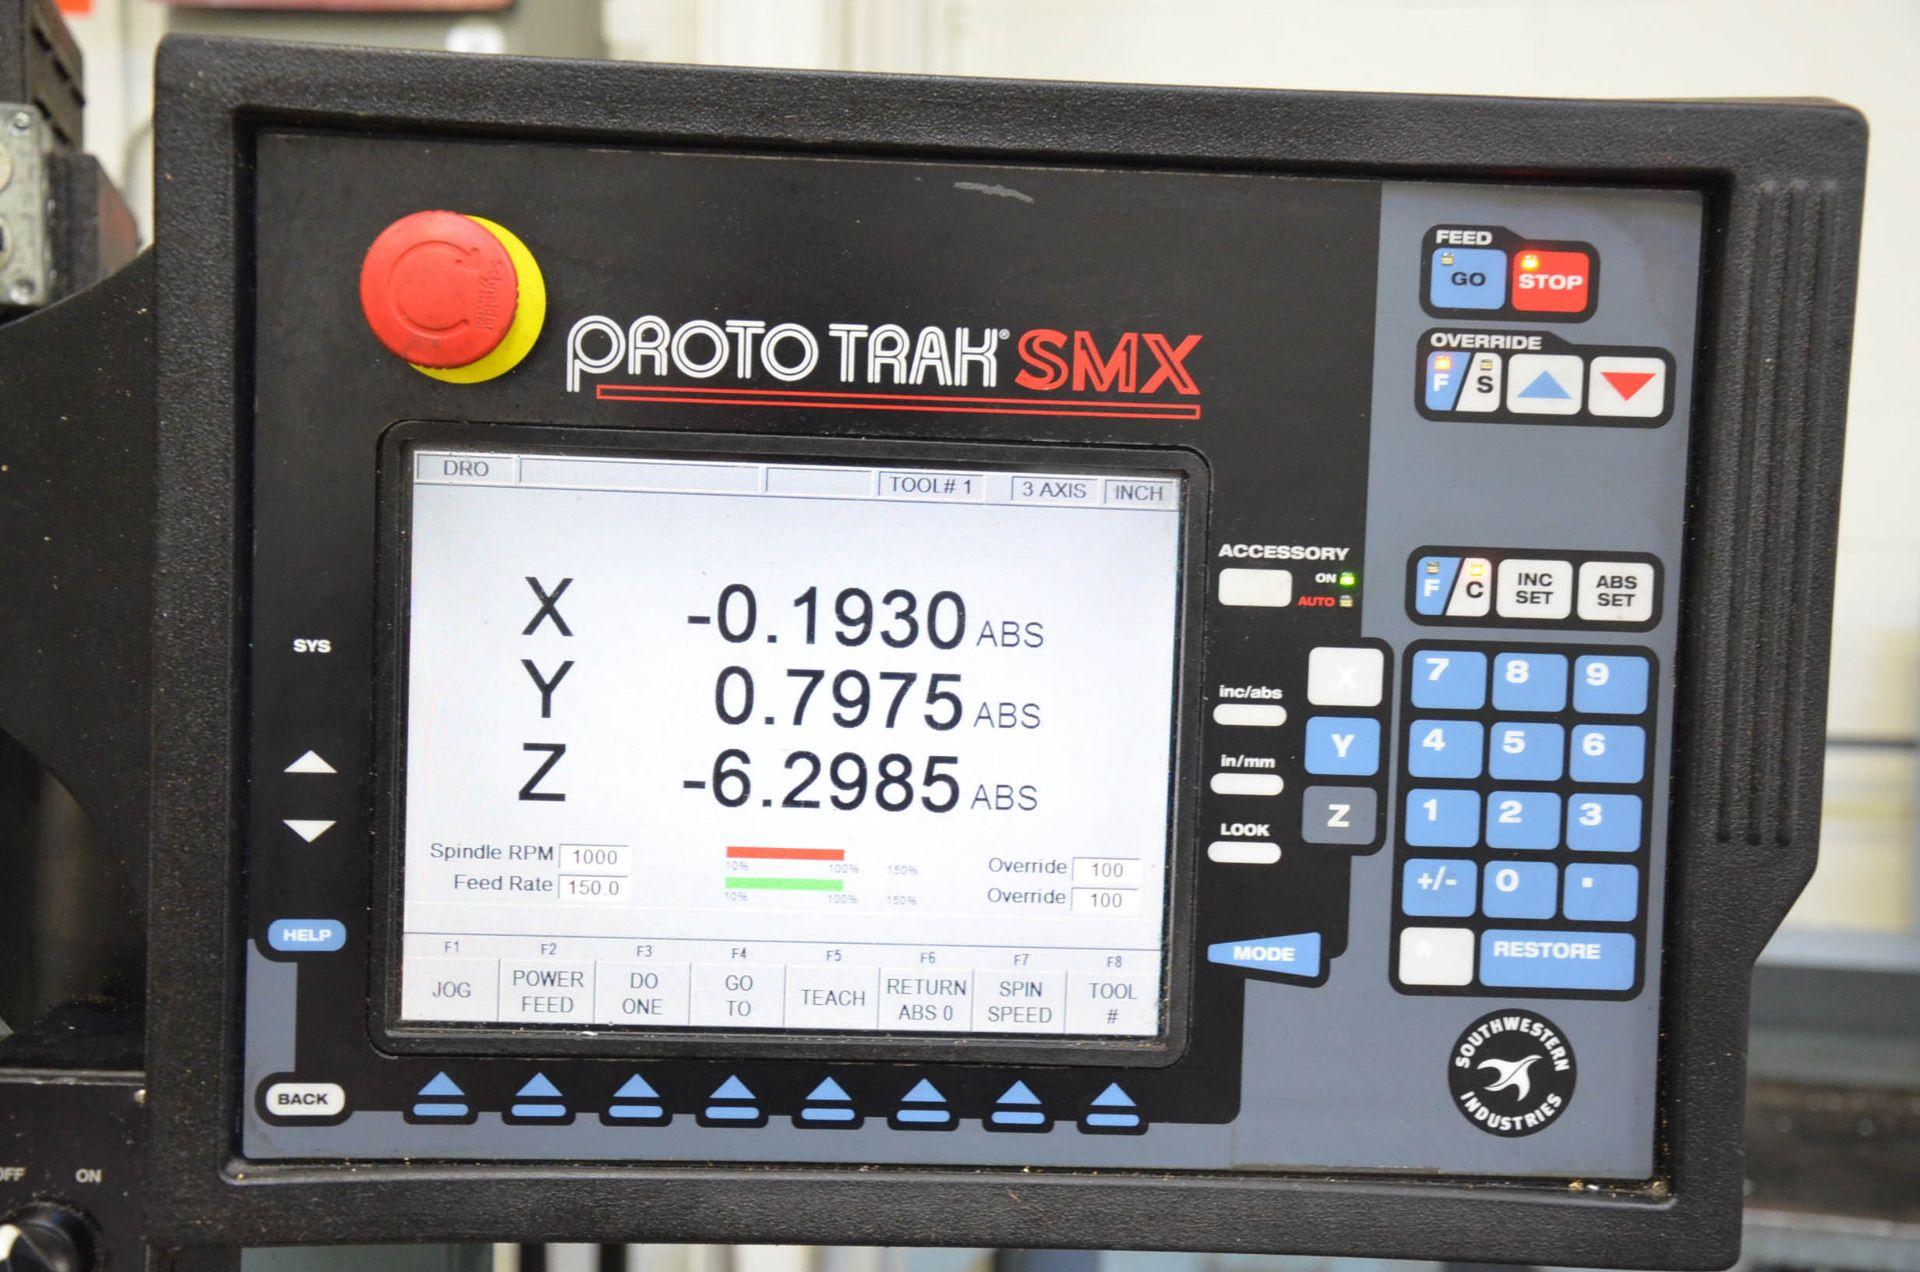 "TRAK DPM3 CNC VERTICAL TURRET MILLING MACHINE WITH PROTO TRAK (2016) SMX CNC CONTROL, 10"" X 50"" - Image 6 of 10"